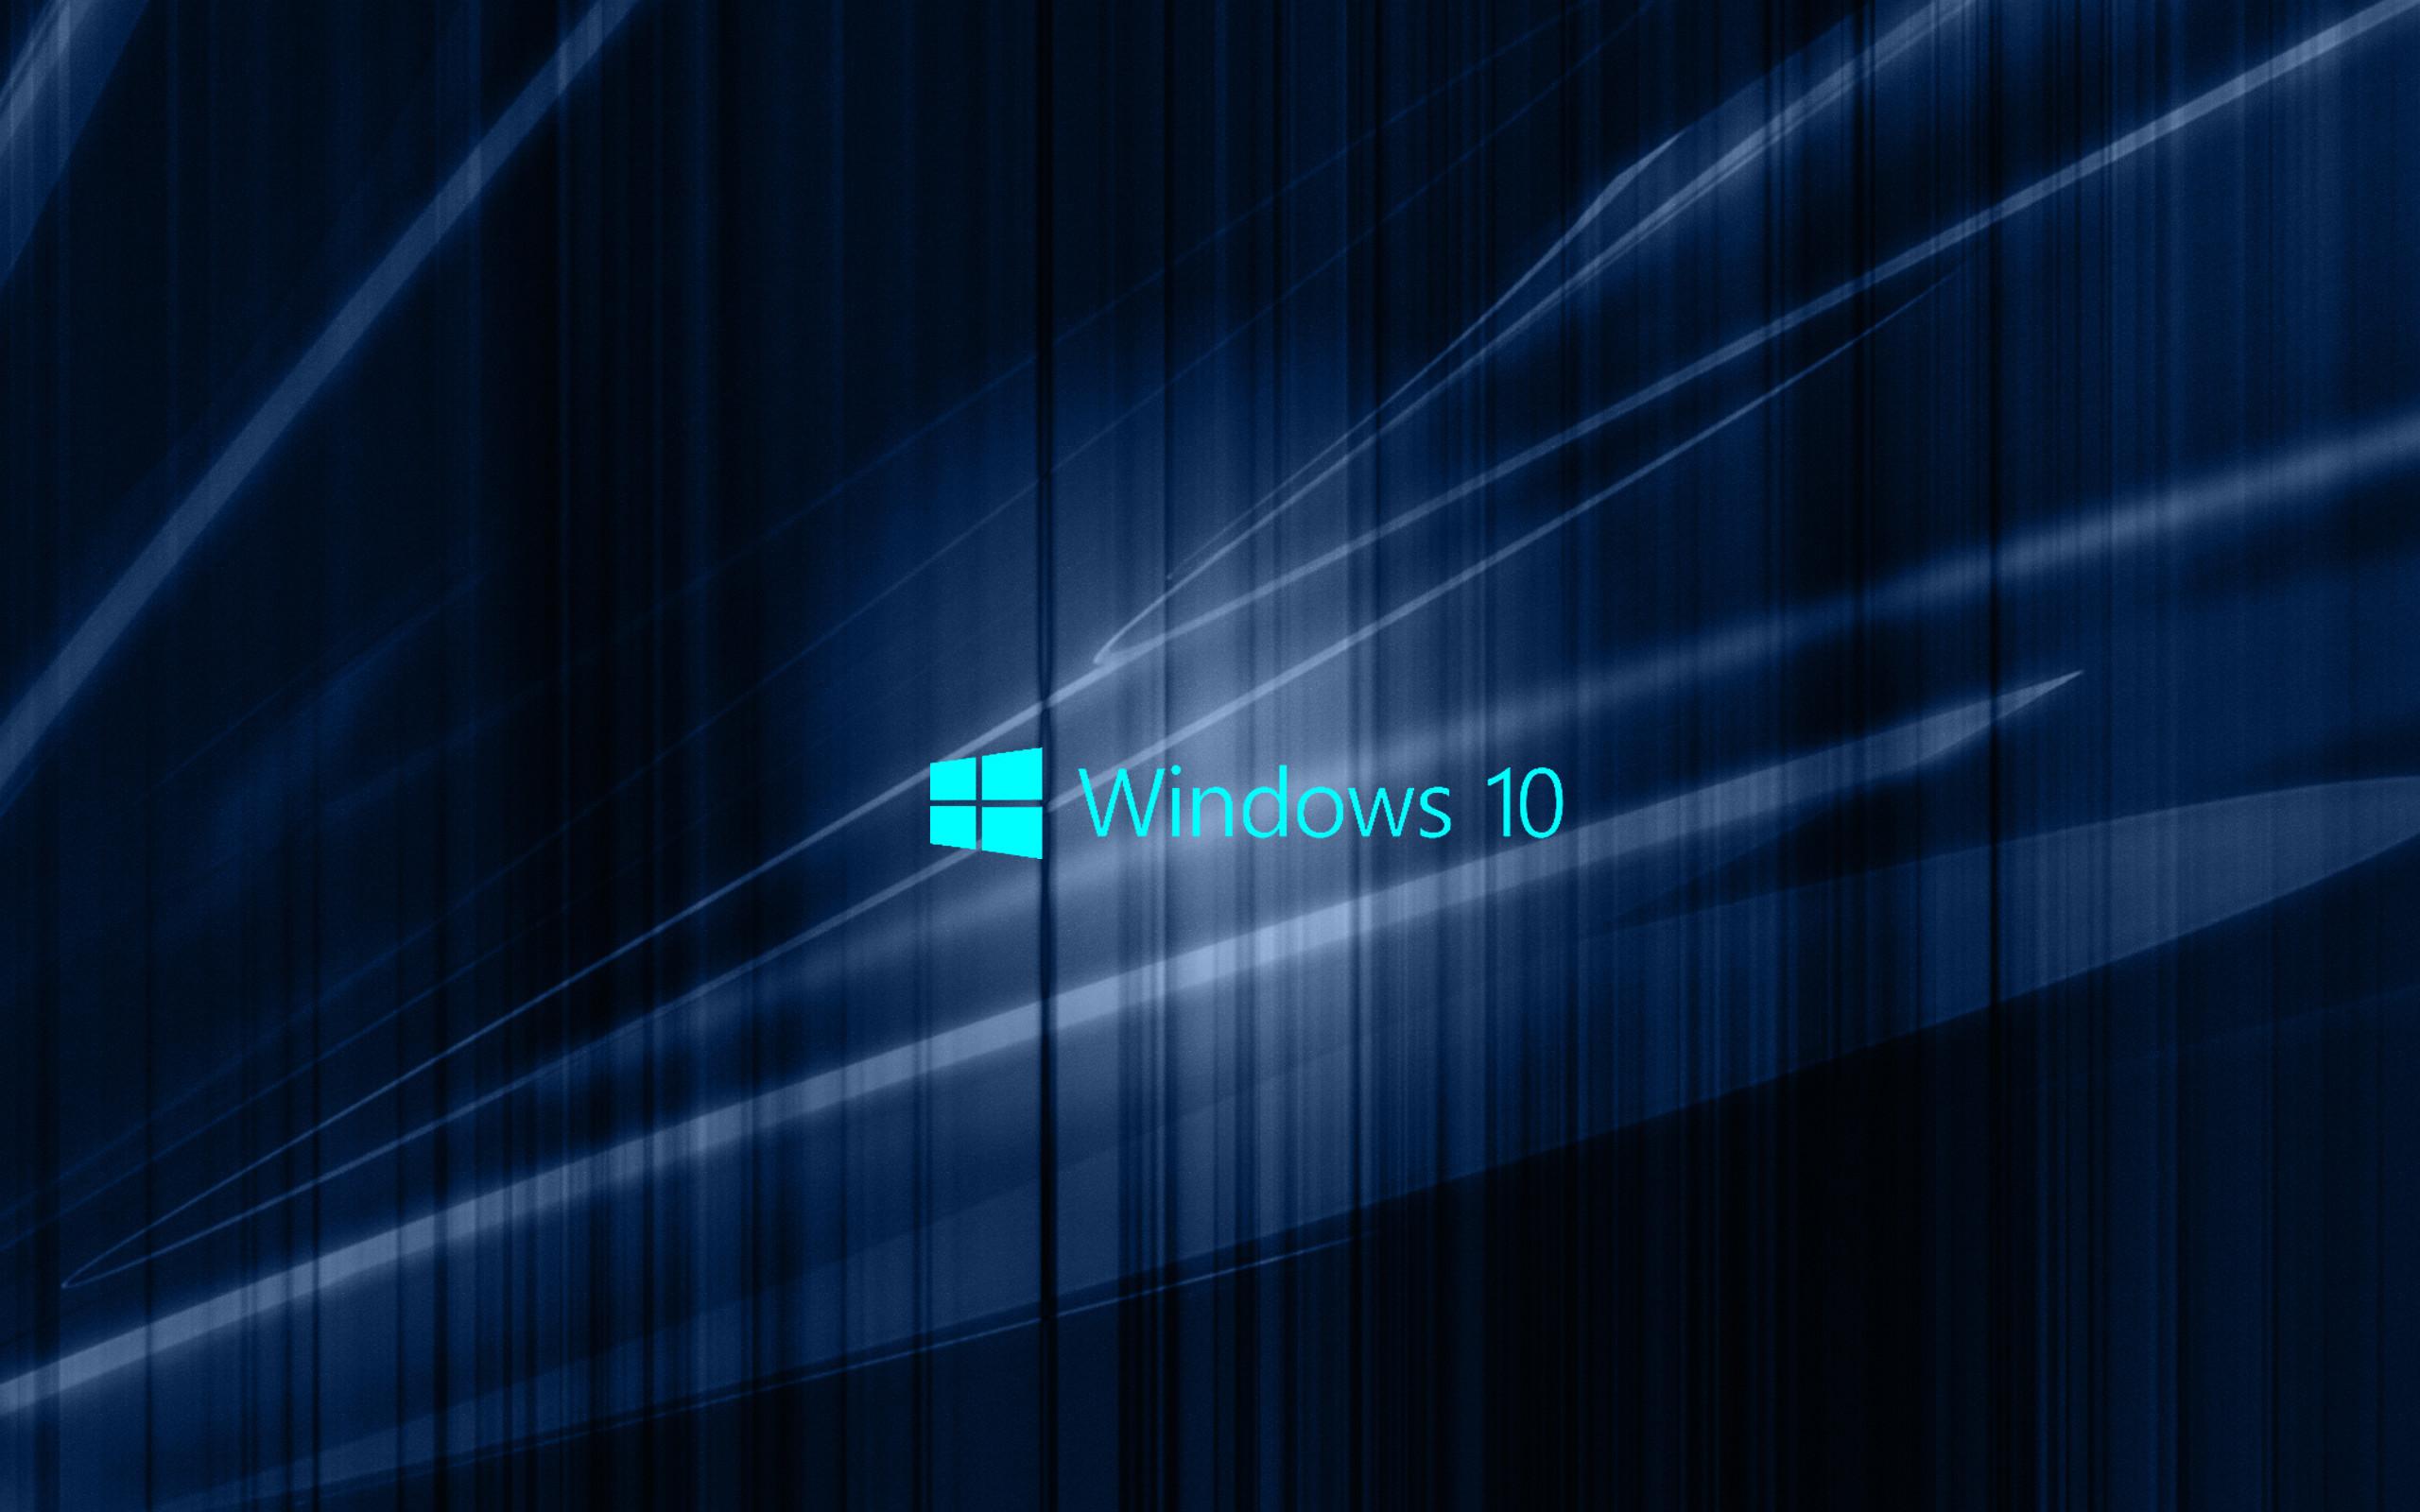 Uhd 3d Wallpaper Download 4k Windows 10 Wallpaper 61 Images